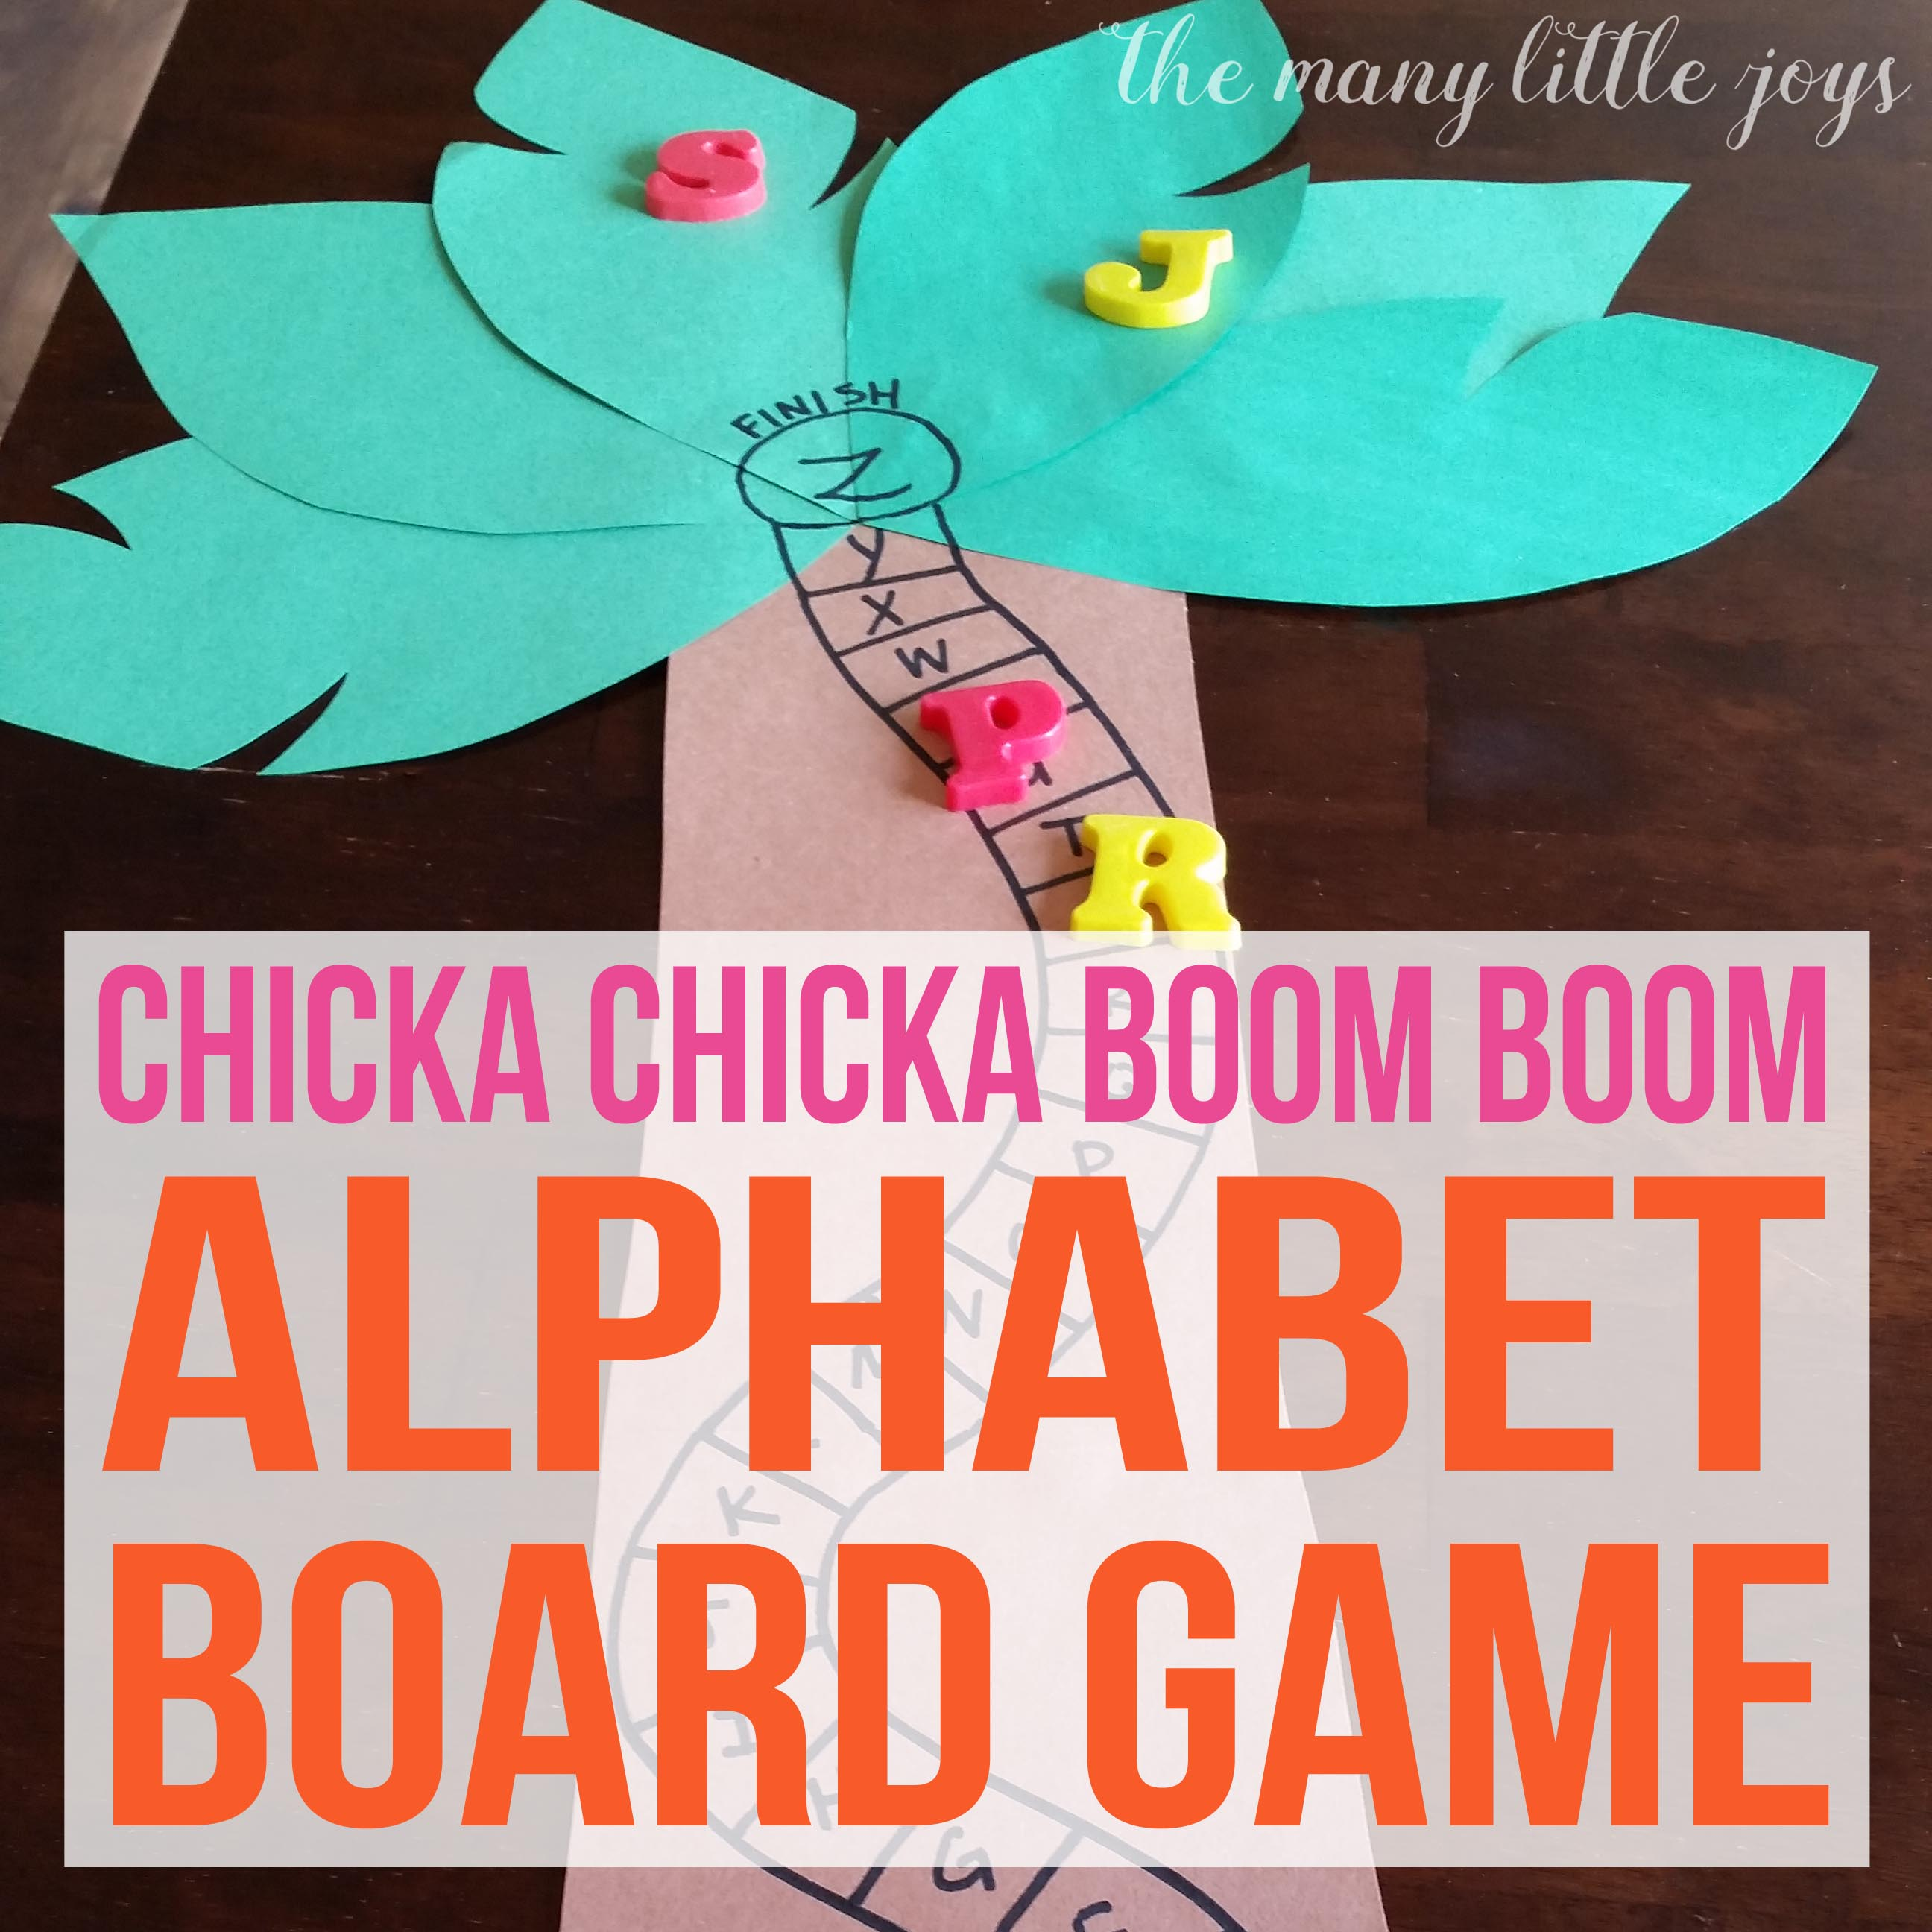 Chicka Chicka Boom Boom Alphabet Game | The Many Little Joys - photo#35